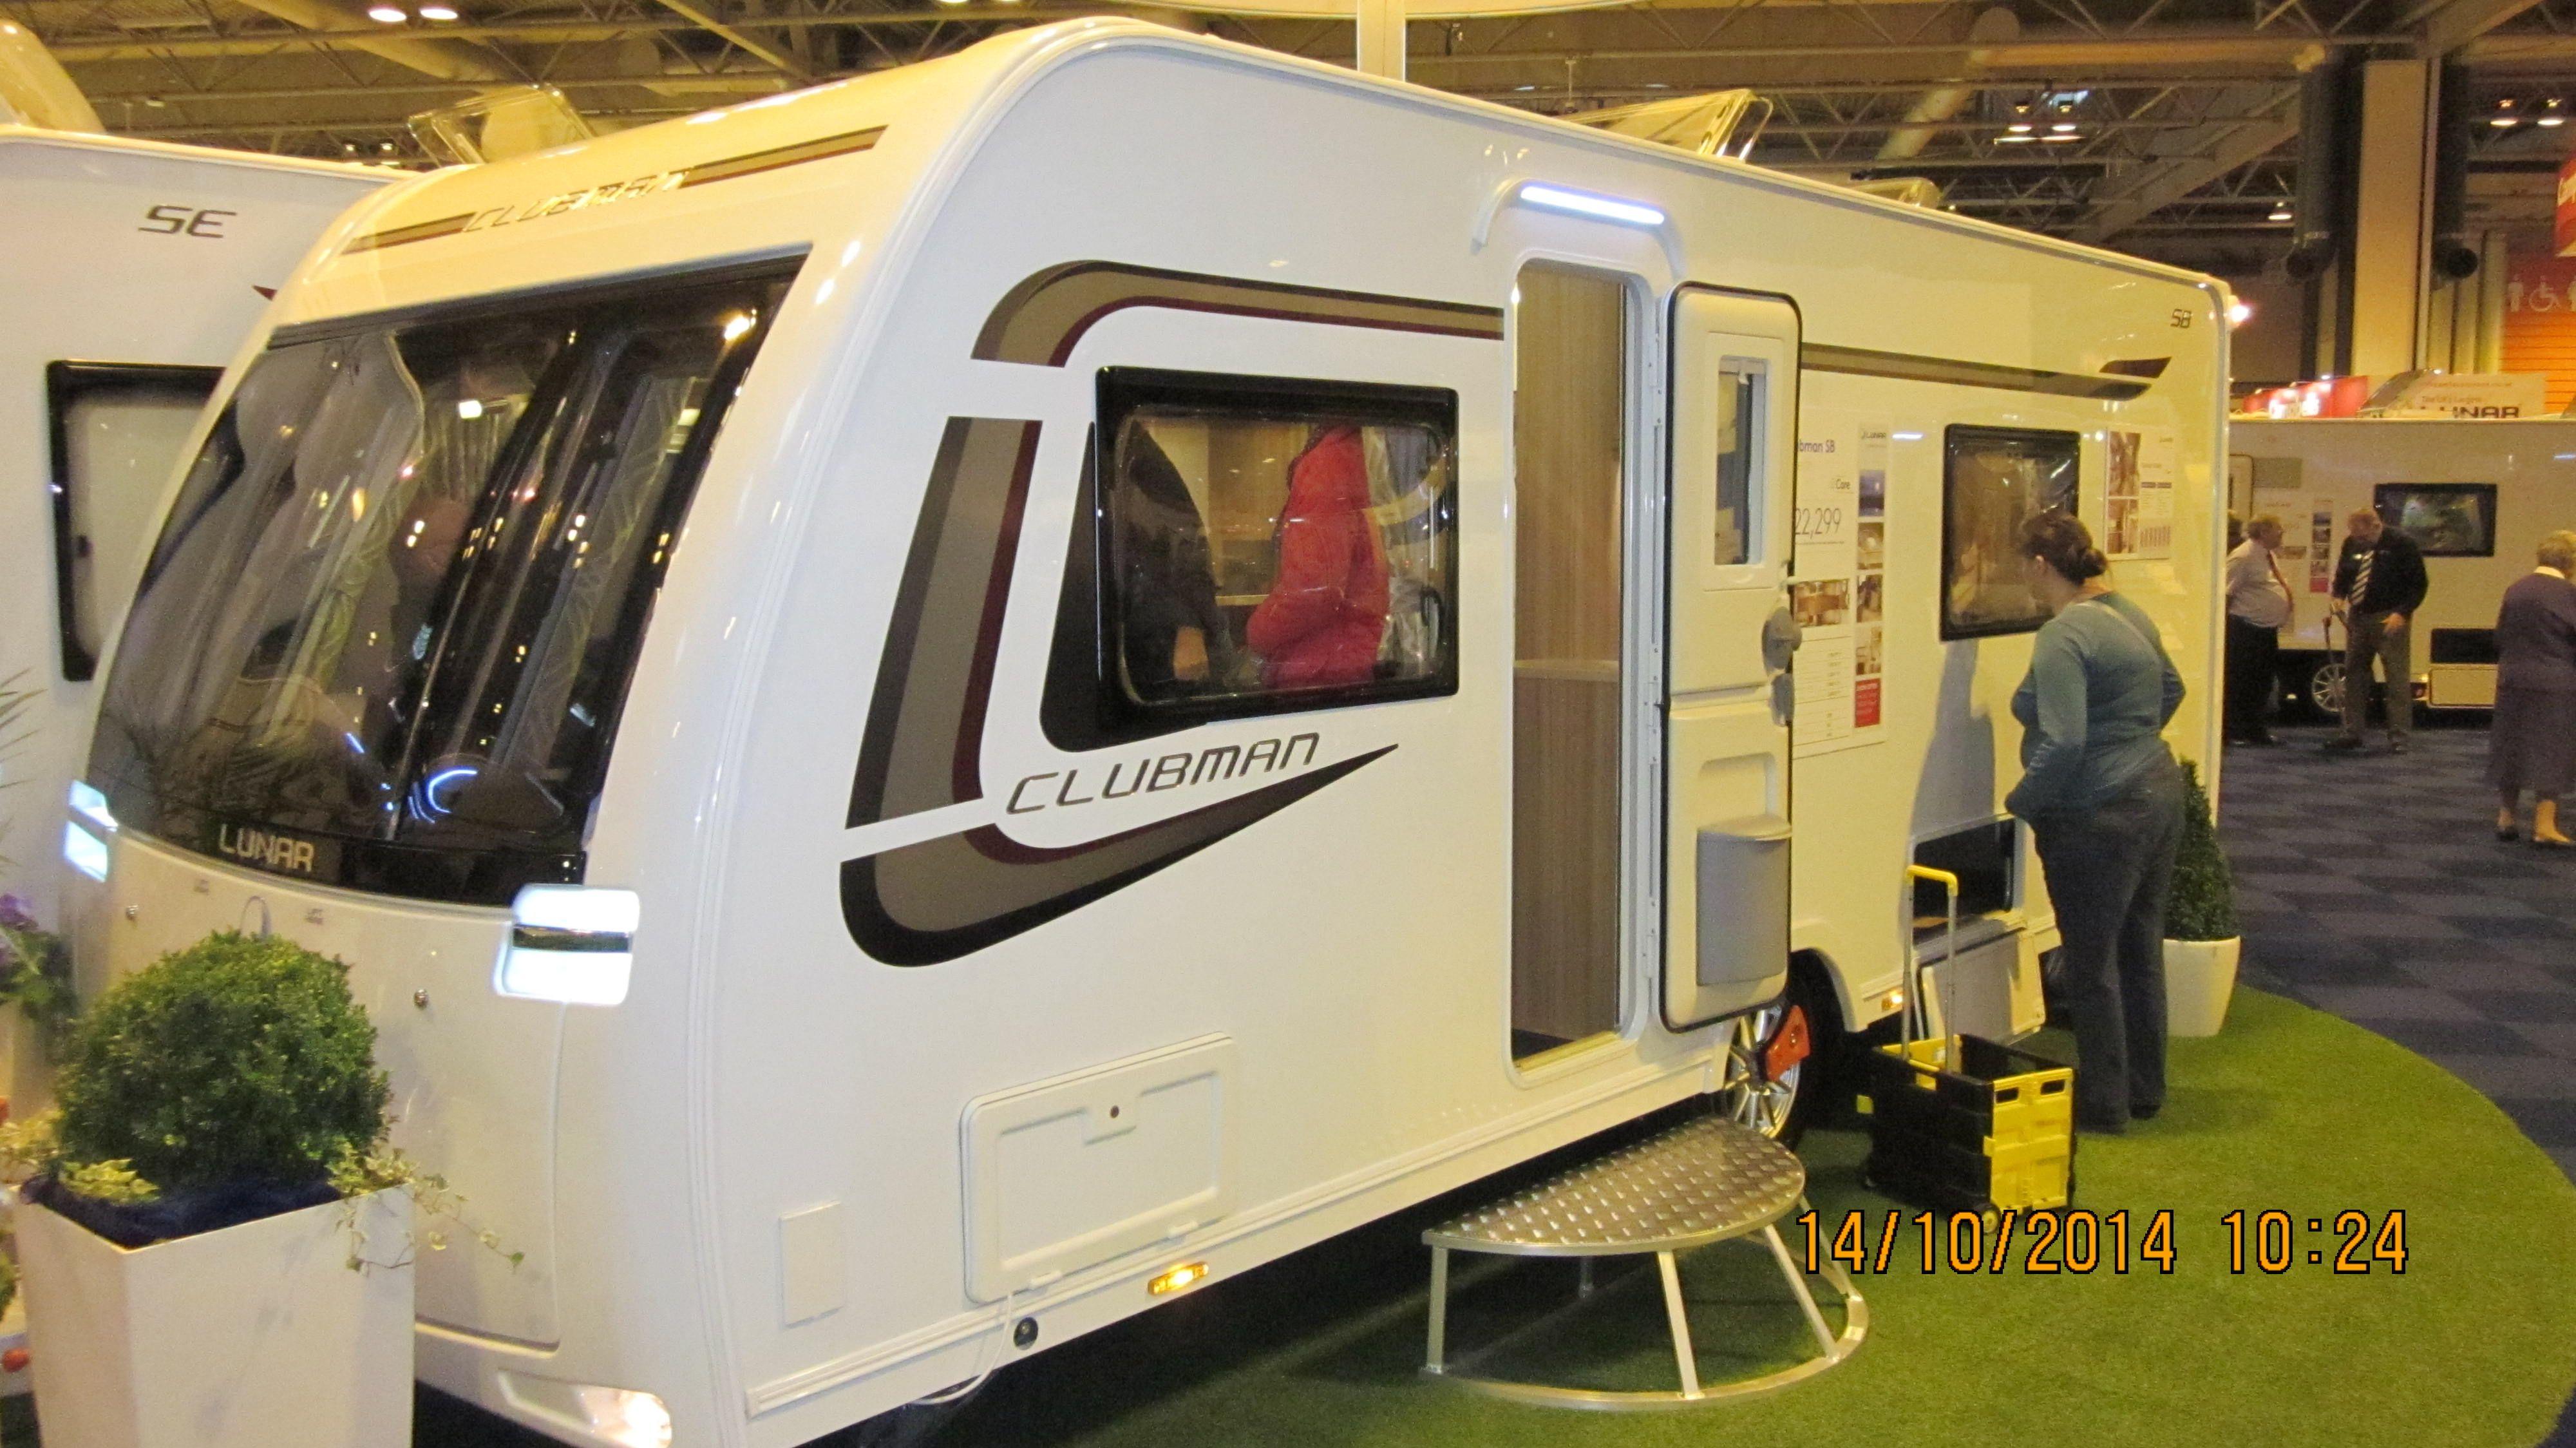 Lunar Clubman Sb A Single Axel Luxury Caravan With Everything You